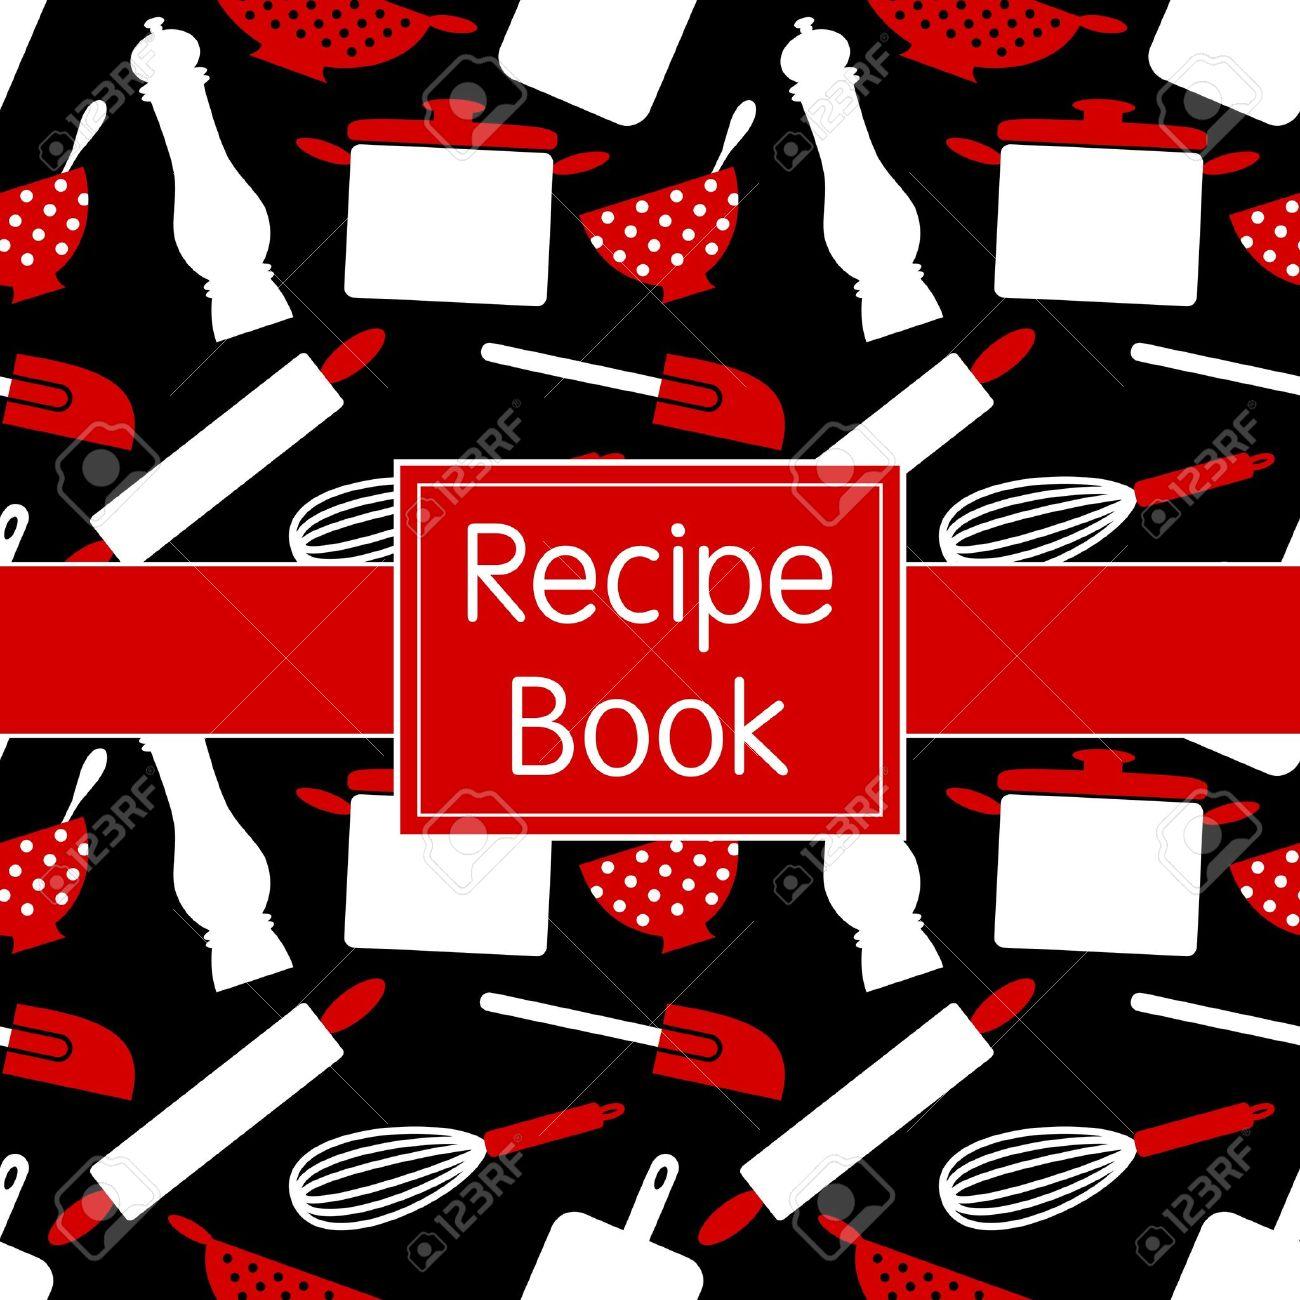 Recipe book cover clipart png transparent download Recipe book cover clipart - ClipartFest png transparent download